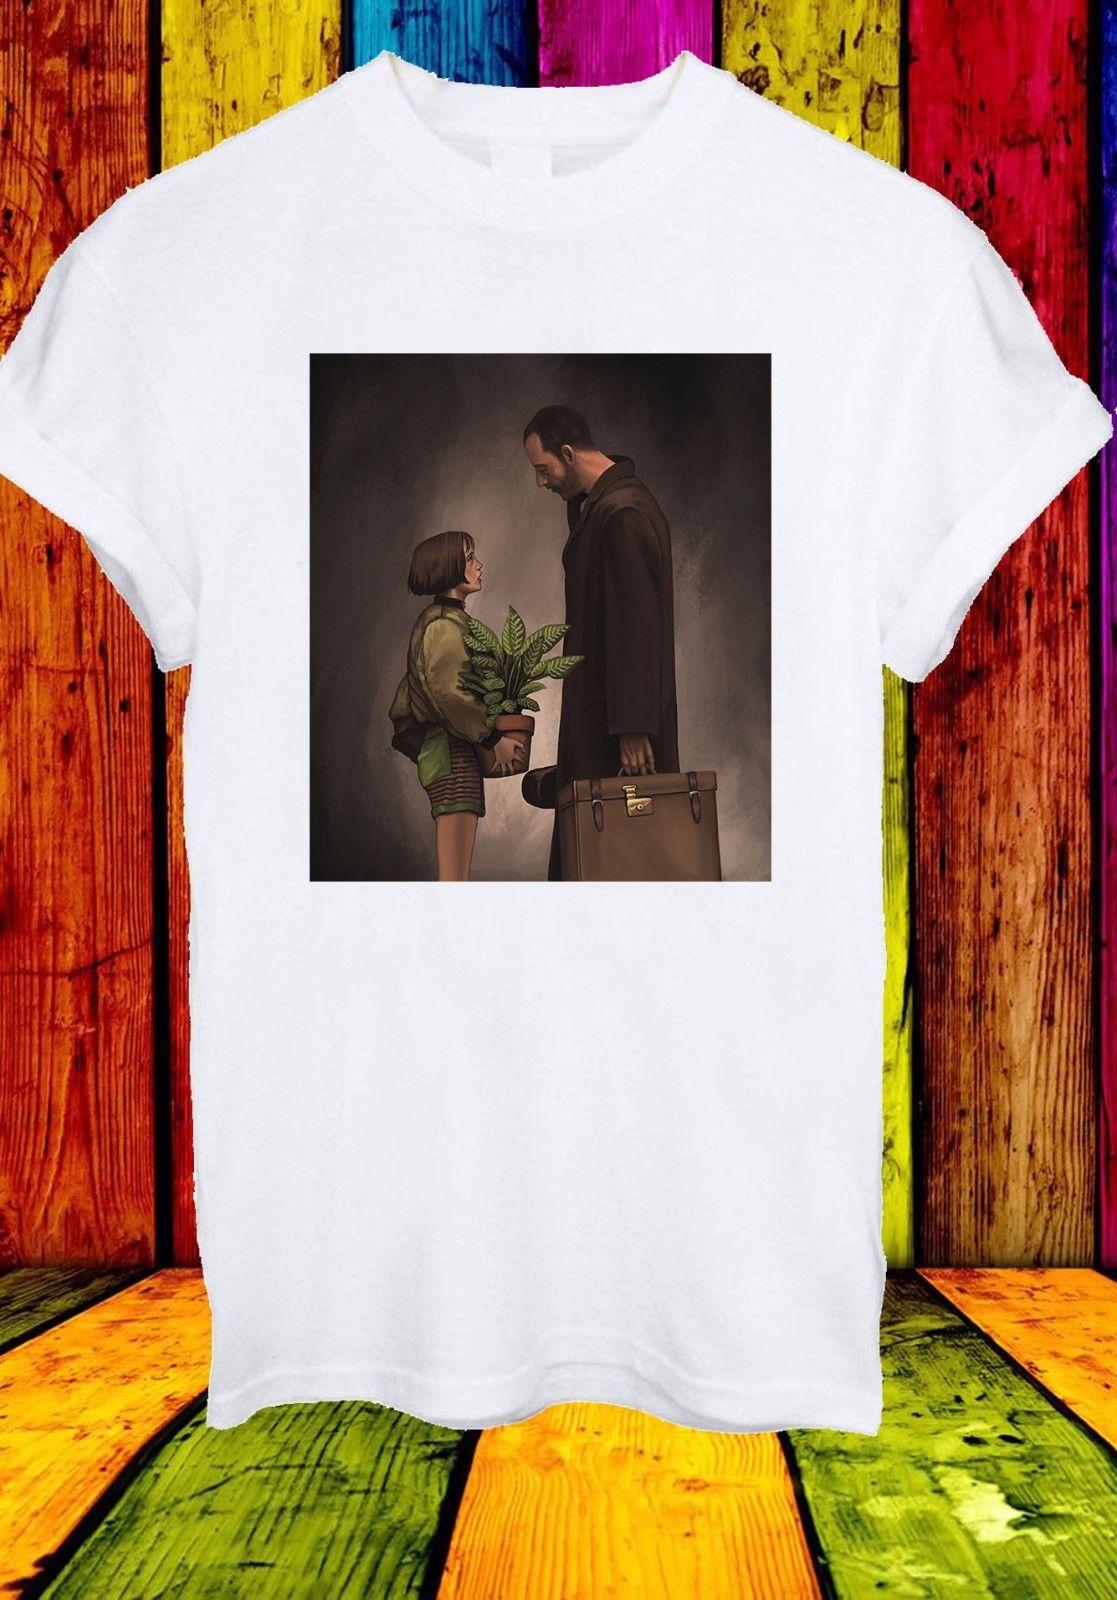 Leon Matilda The Professional Jean Reno Movie Film Men Women Unisex T-shirt 756